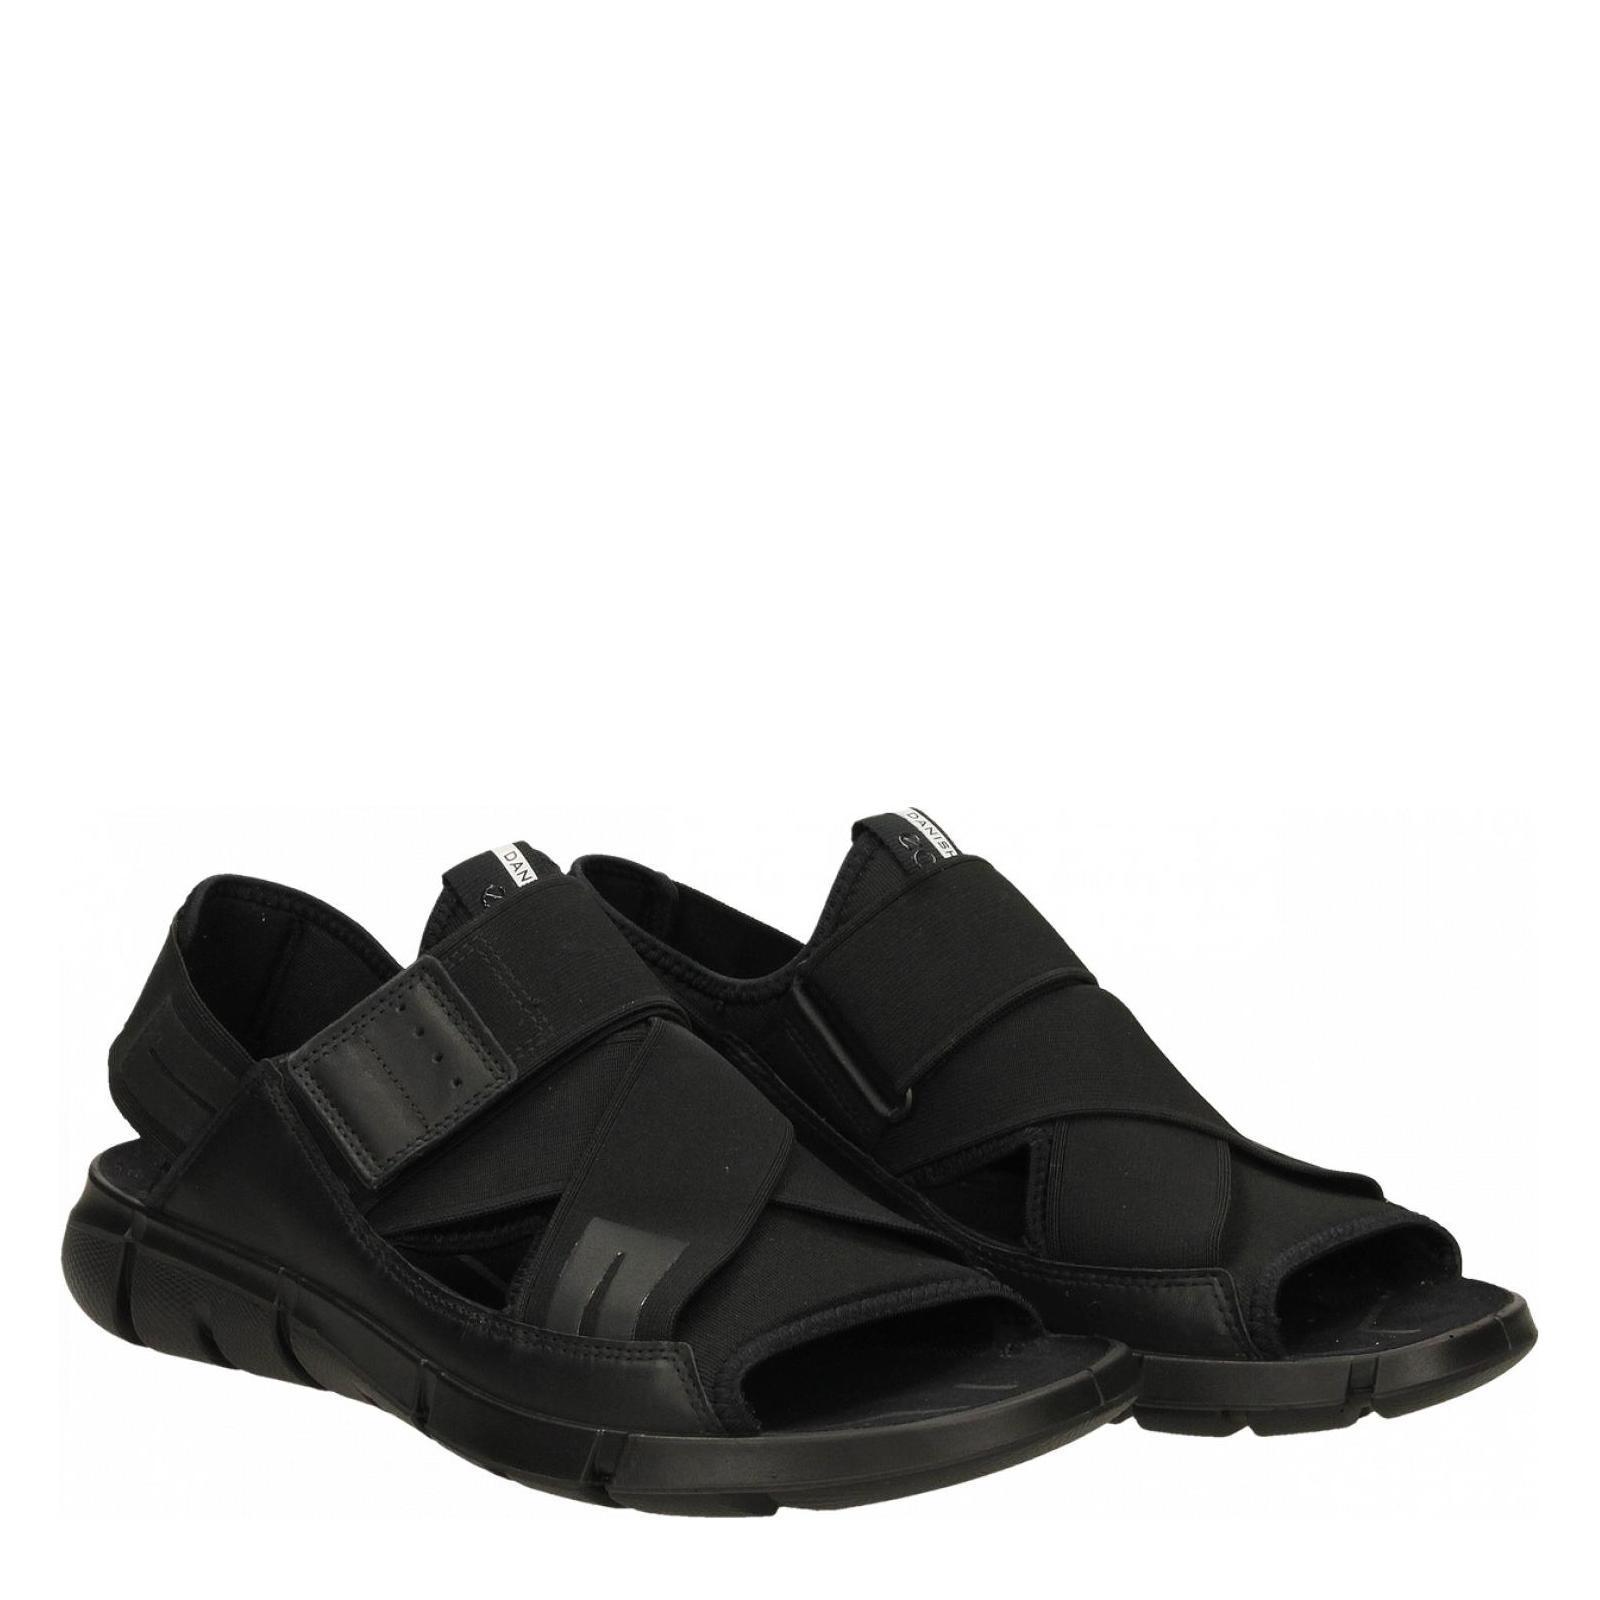 Intrinsic Sandal Black/Black Toffel/Tex